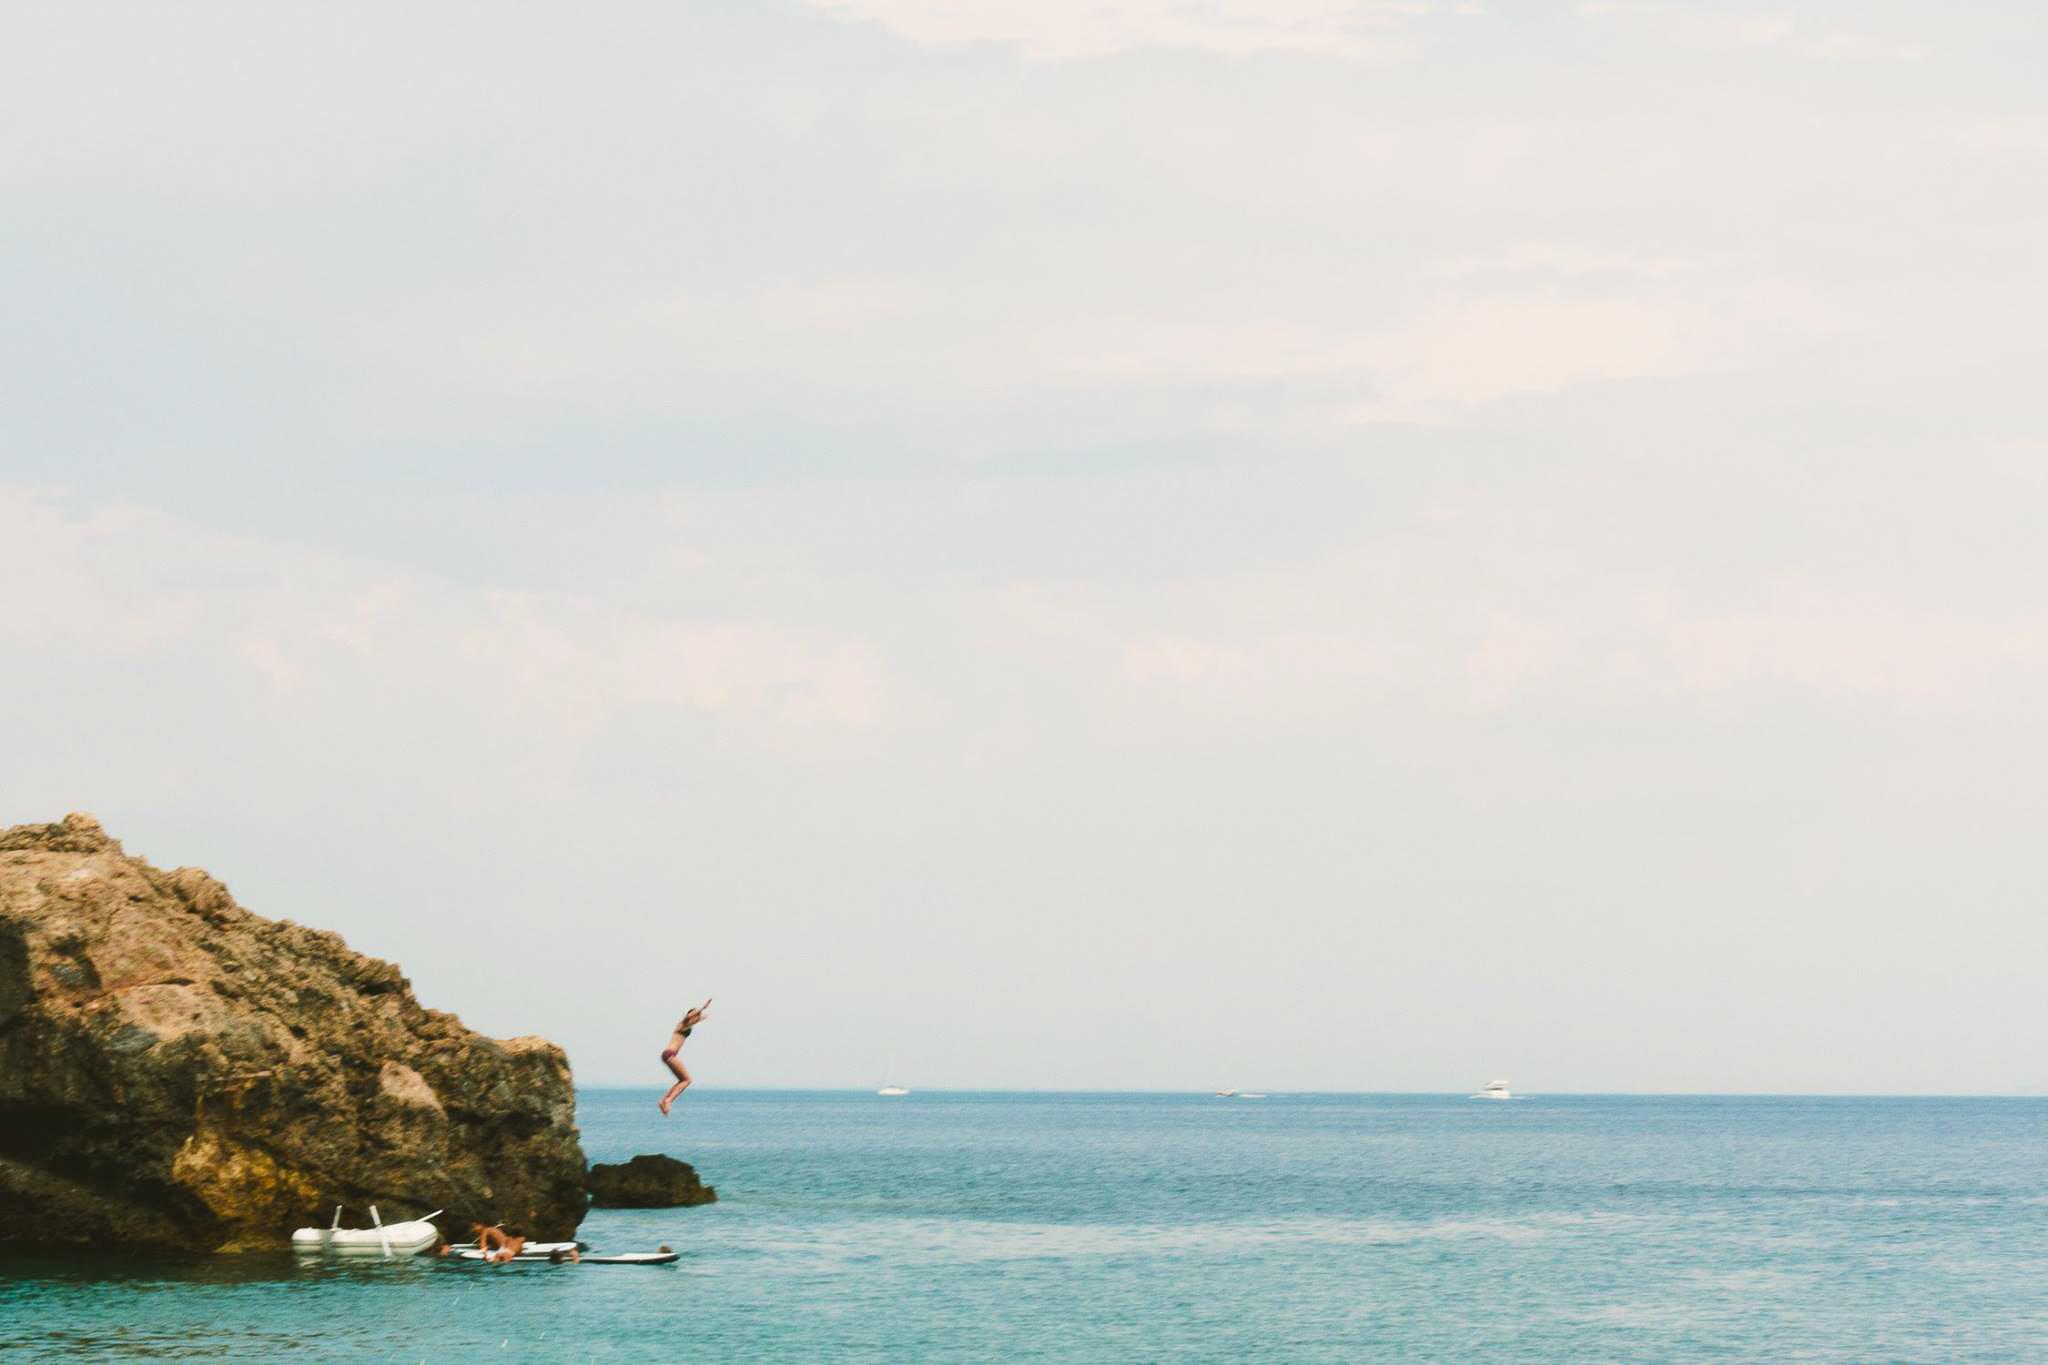 Me, jumping into 2017 (aka the Mediterranean Sea).